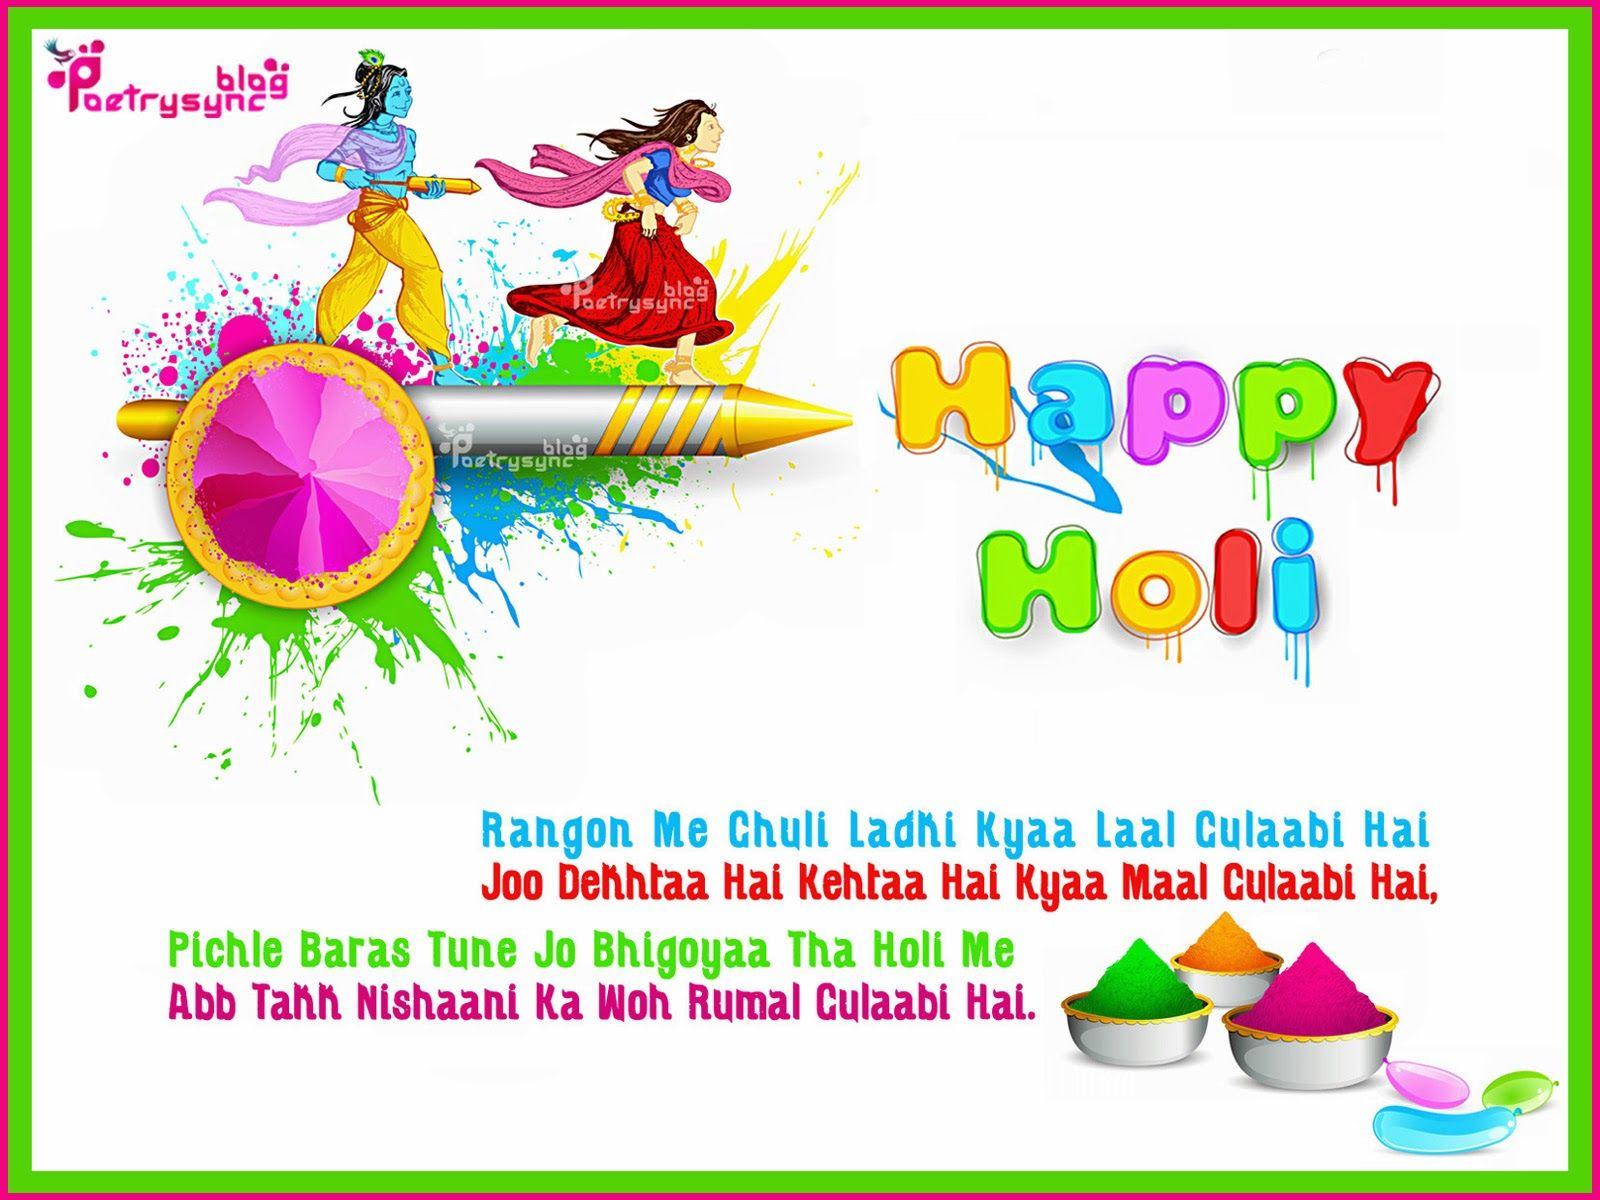 Happy holi radha krishna images - Happy Holi Facebook Status Wishes Krishna Radha On With Holi Hindi Sms Message Image